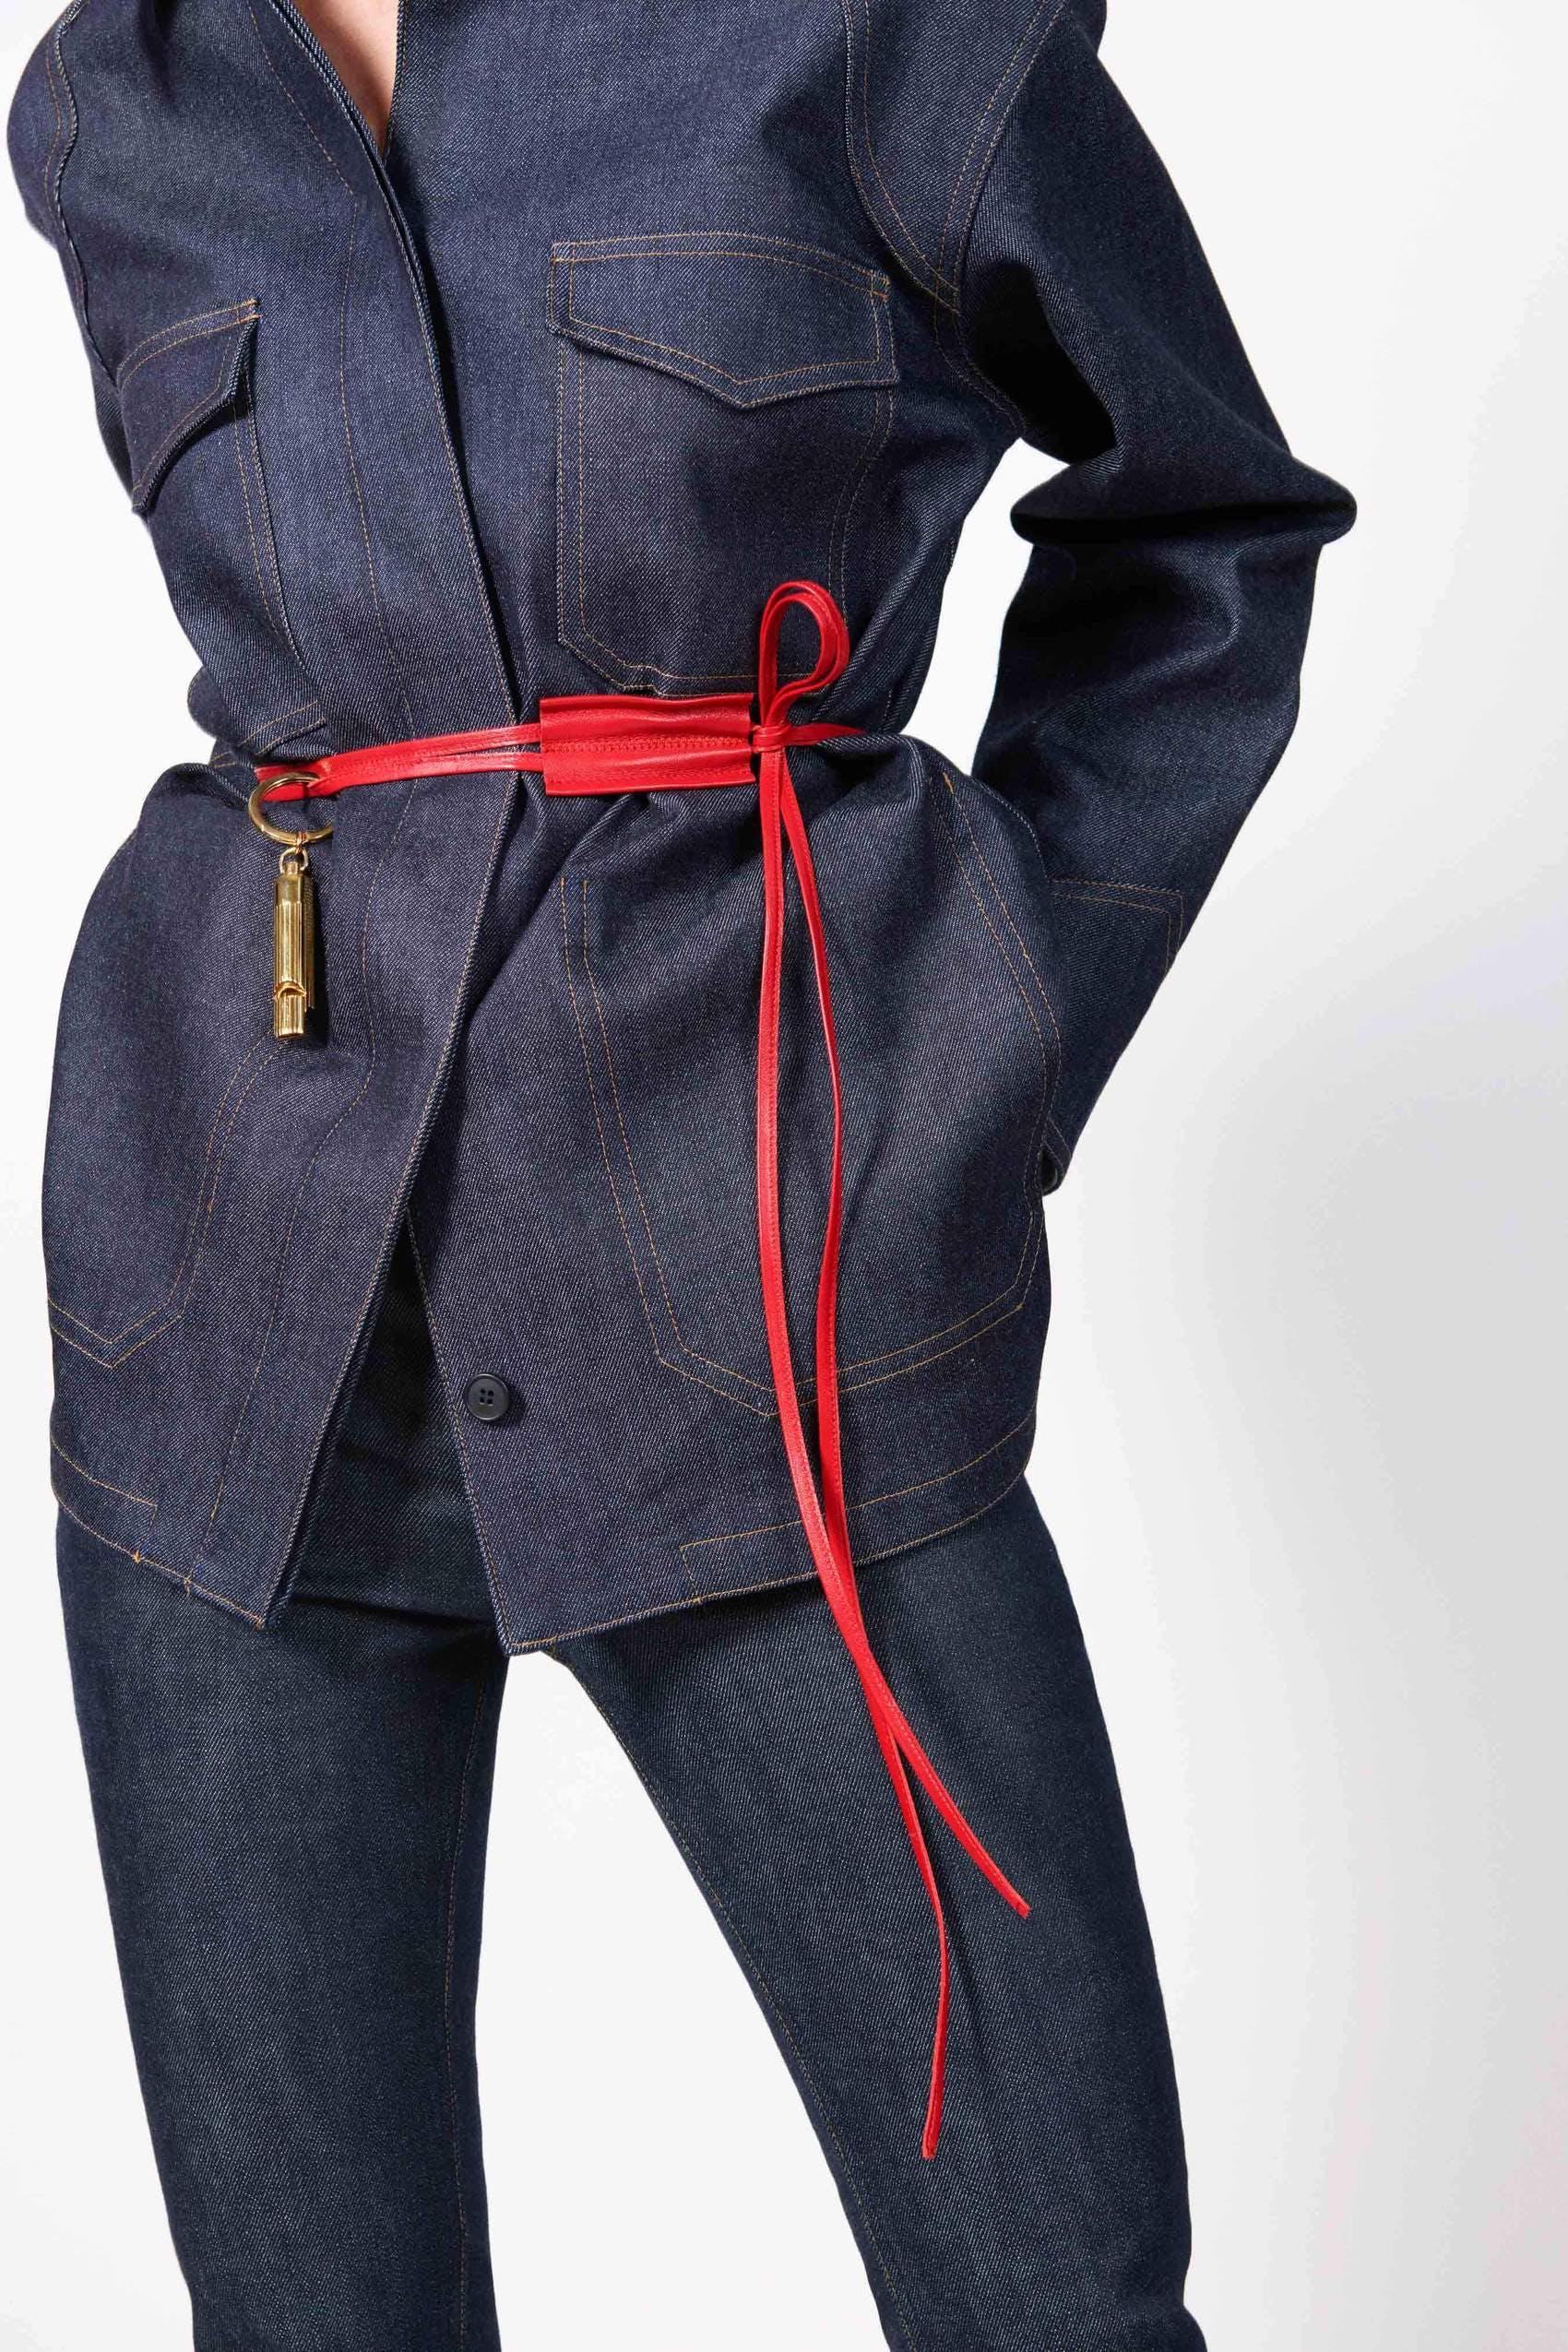 victoria beckham, victoria beckham denim, victoria beckham jeans, wrap belt, denim jacket, raw denim, red belt